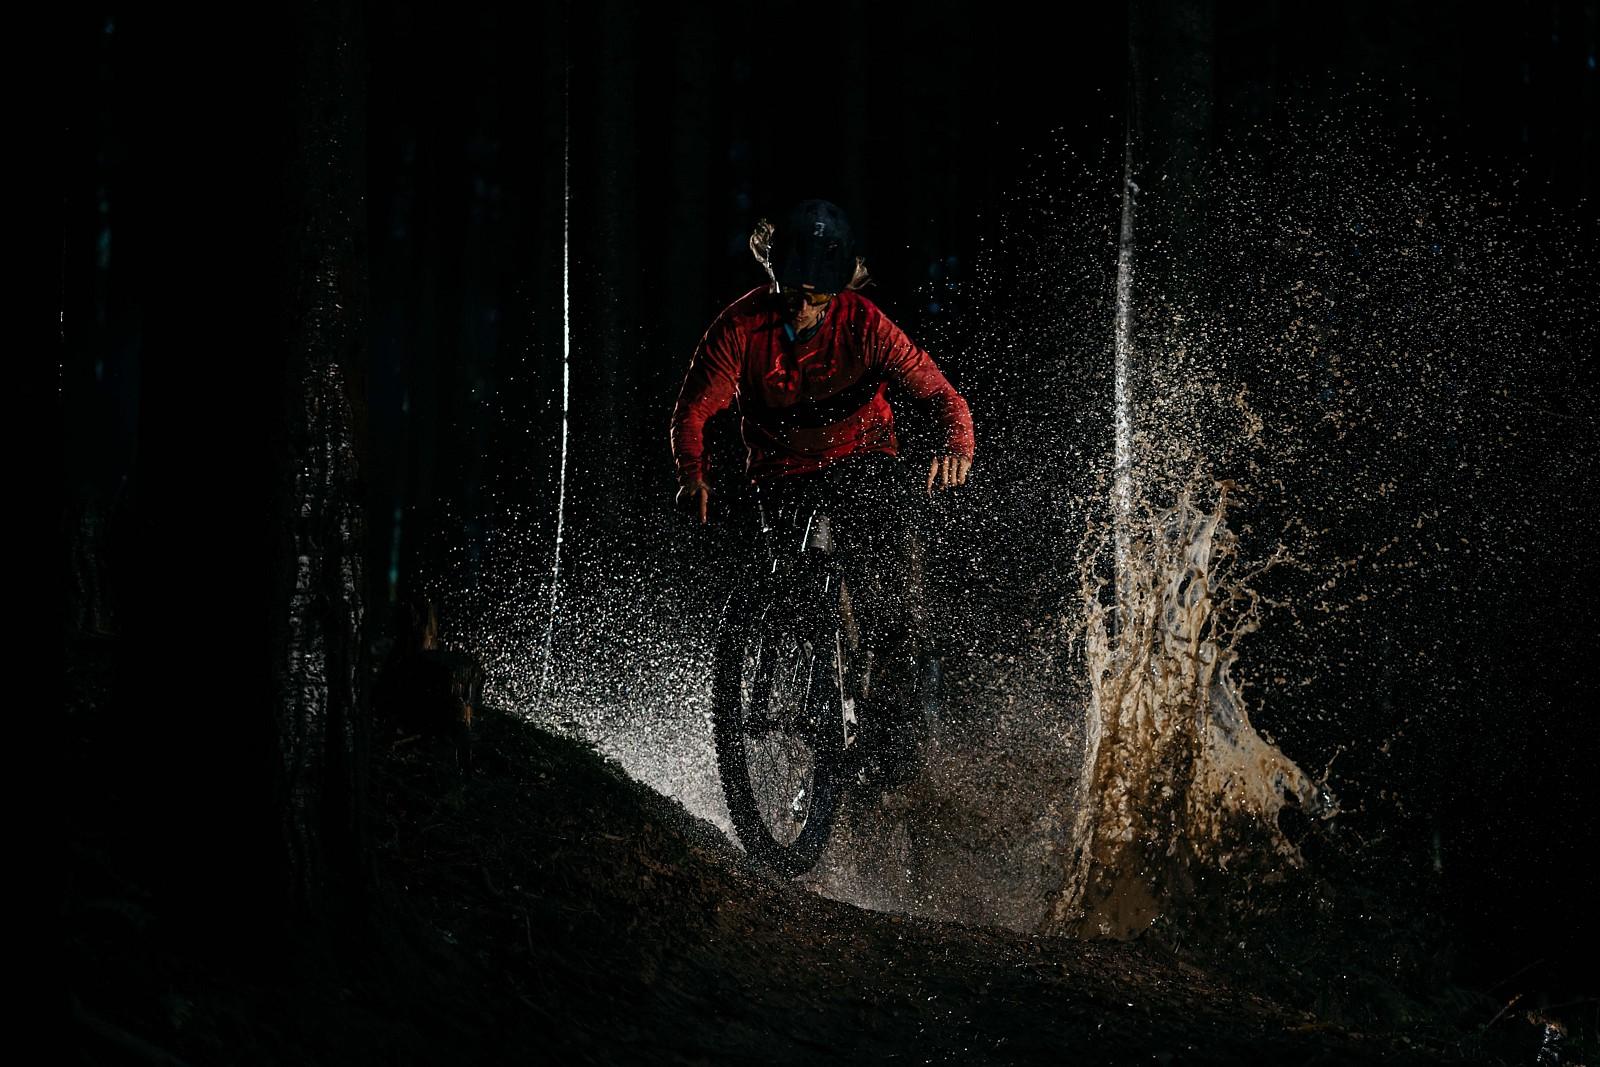 DSC00965 - storczyk - Mountain Biking Pictures - Vital MTB